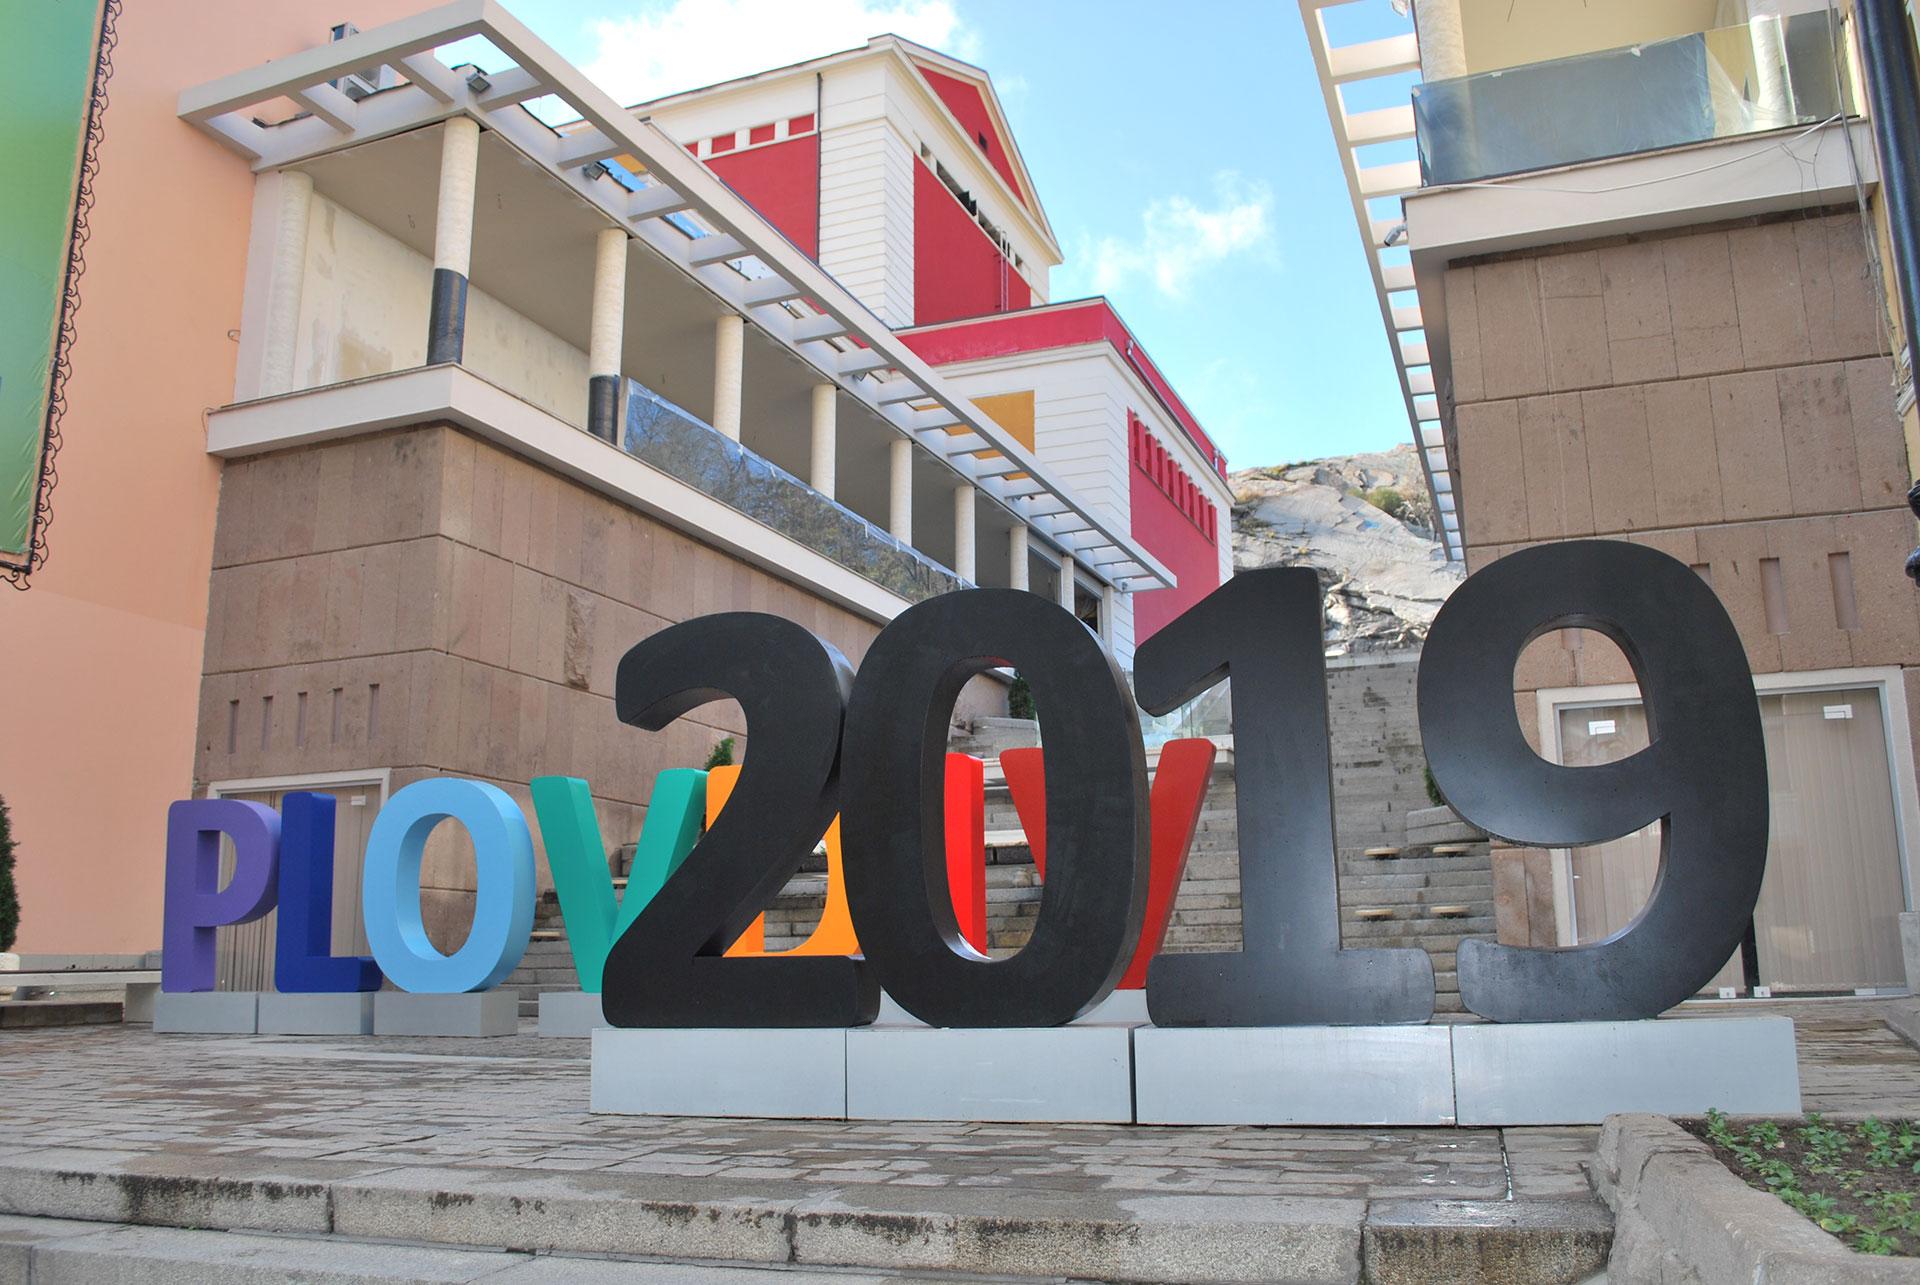 Plovdiv-CulturalCapital